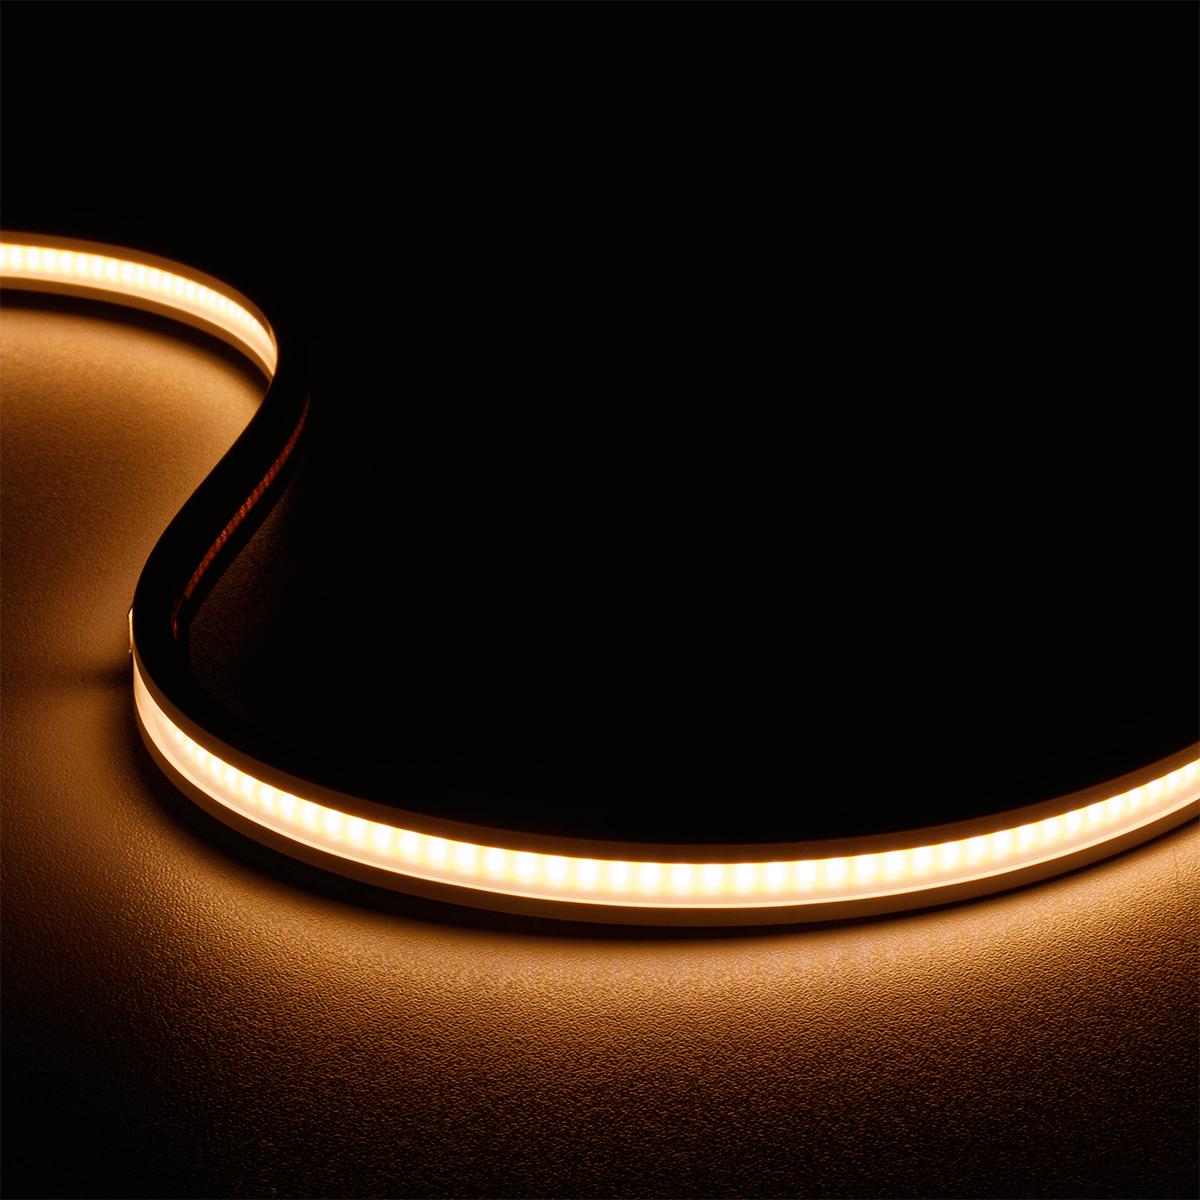 COB Warmweiß 24V LED Streifen 5M 7,7W/m 336LED/m IP67 3000K